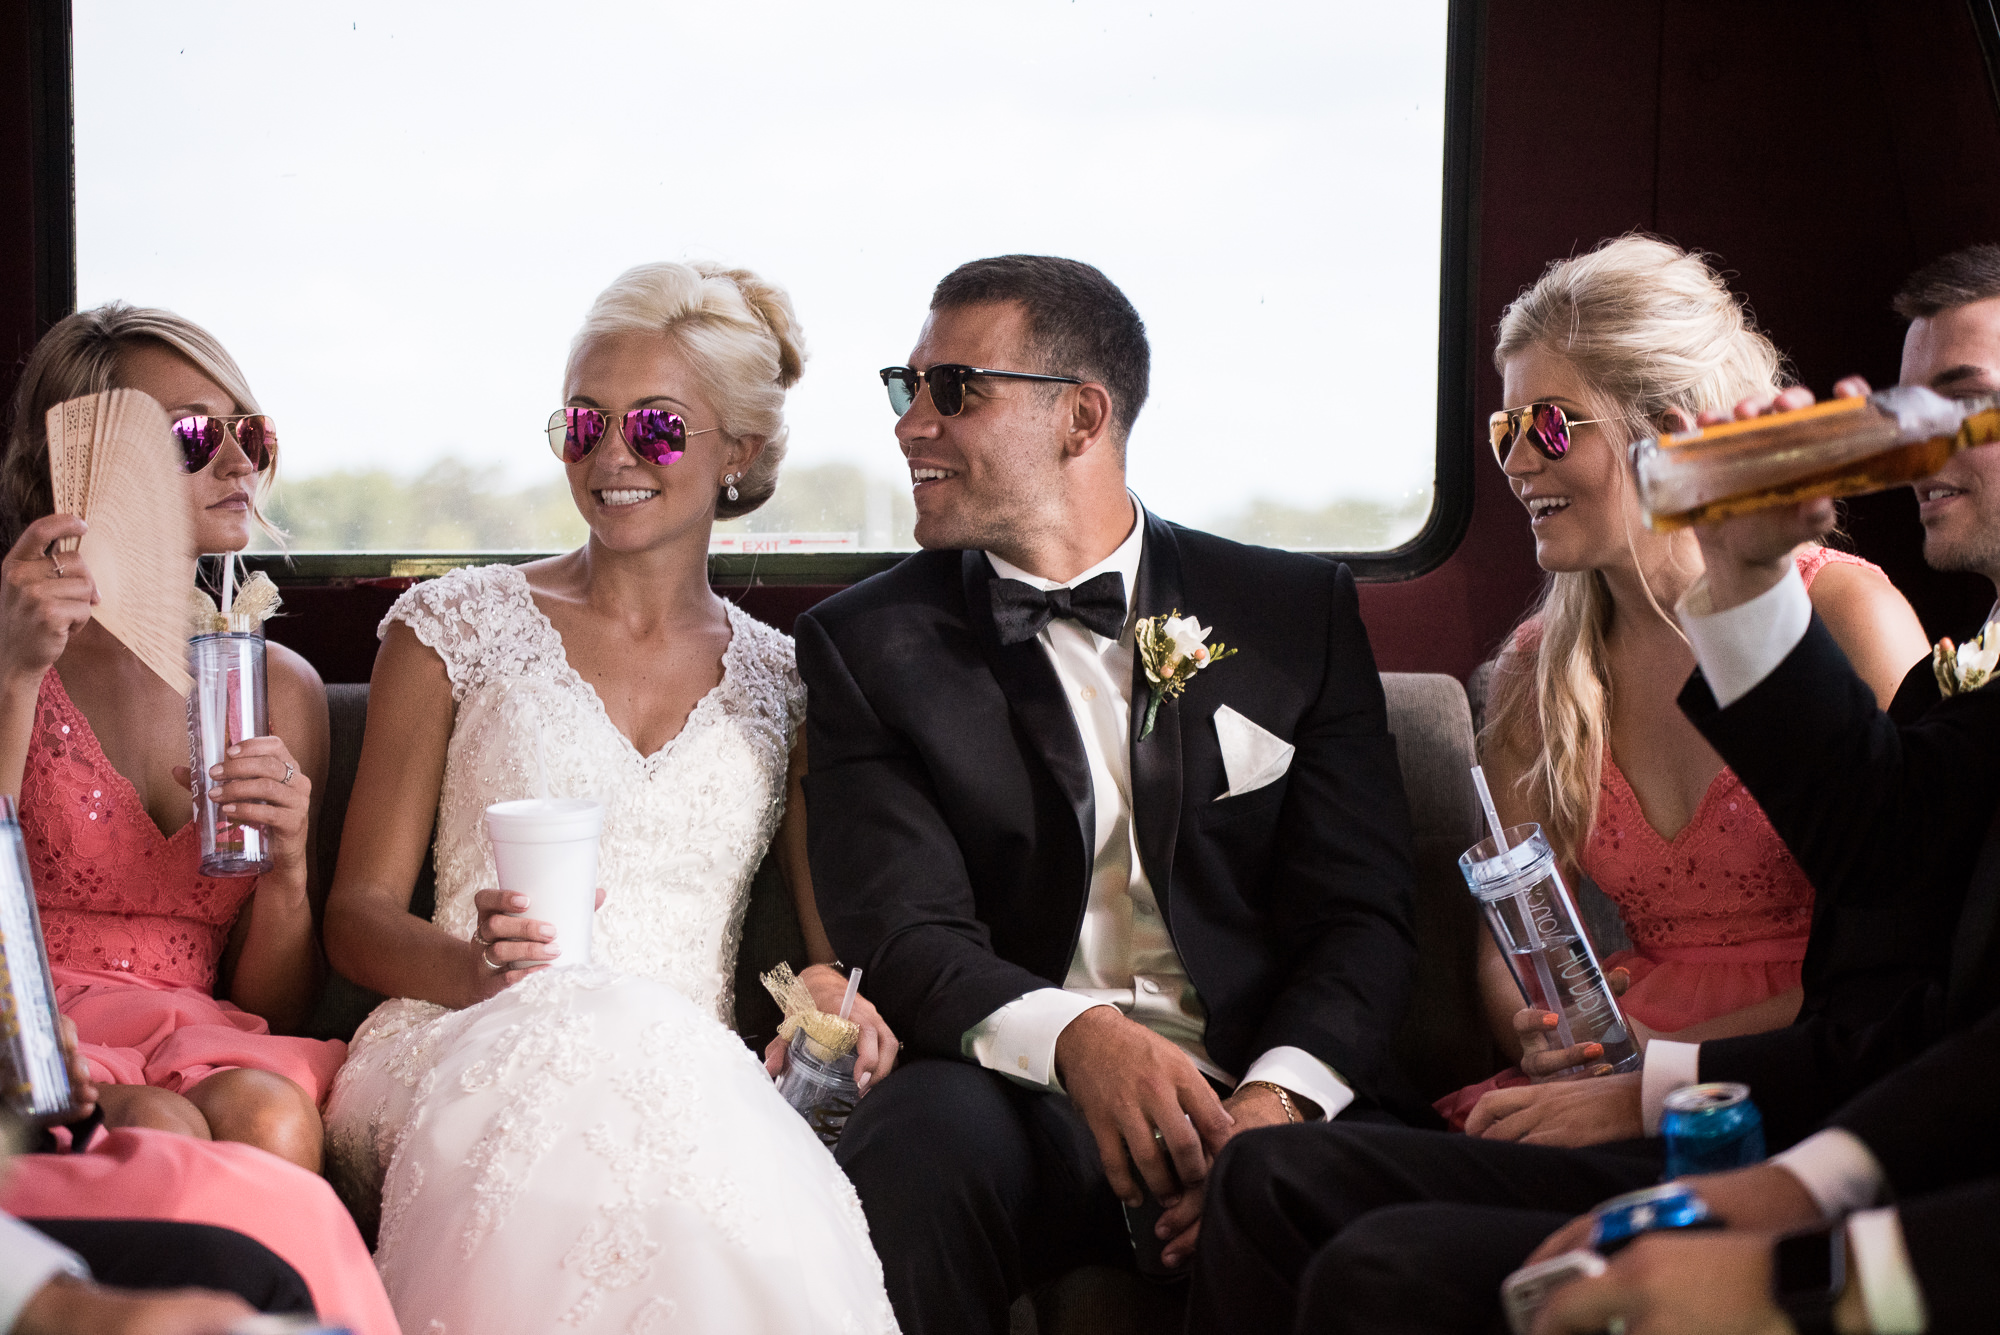 DAKOTA-DUNES-WEDDING-SOUTH-DAKOTA-WEDDING-PHOTOGRAPHER-0019.jpg